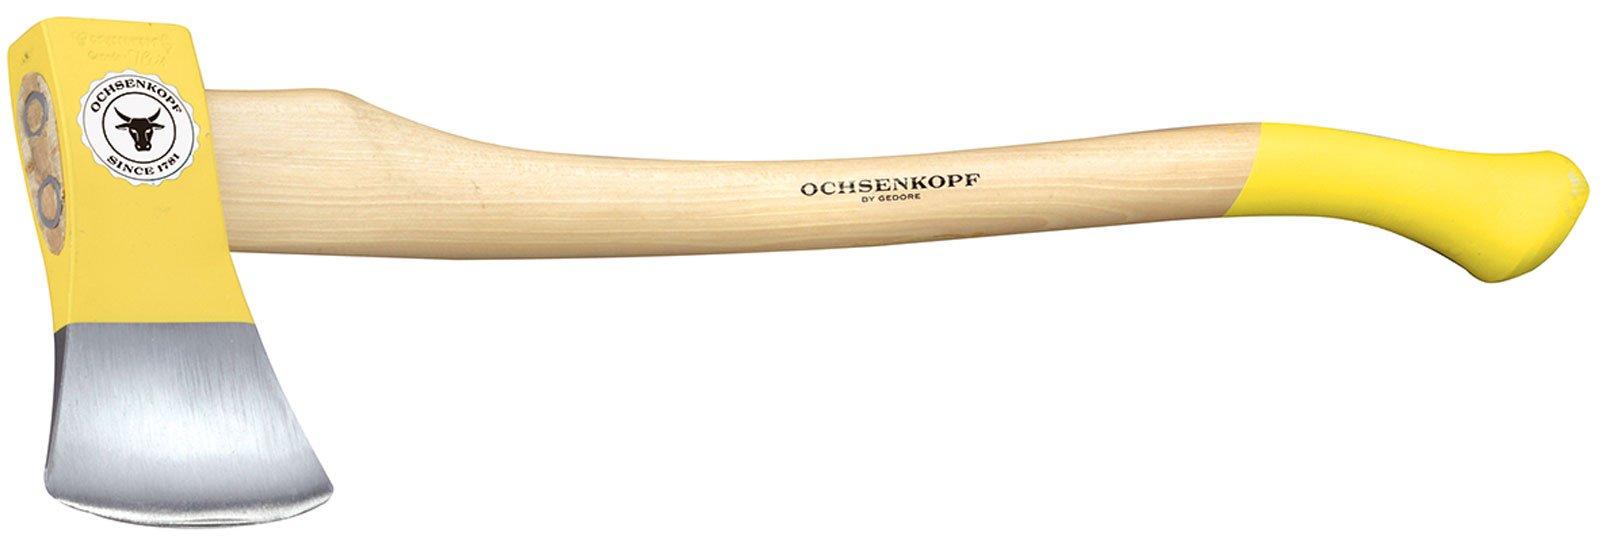 Ochsenkopf OX 15 H-1007 OX 15 H-1007 Axe ILTIS Model Canada